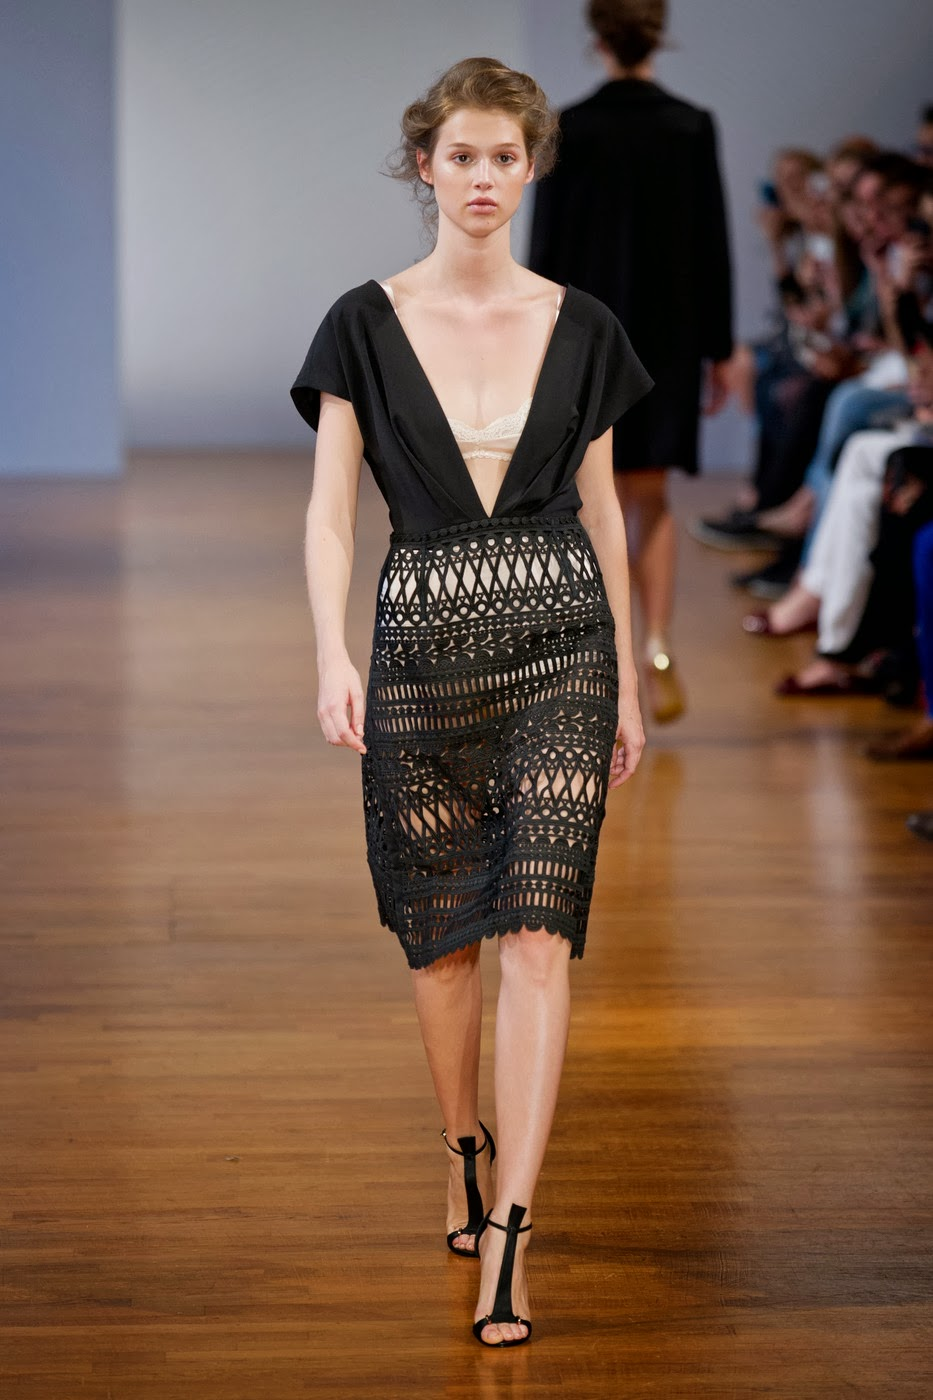 Collette dinnigan fashion show 1